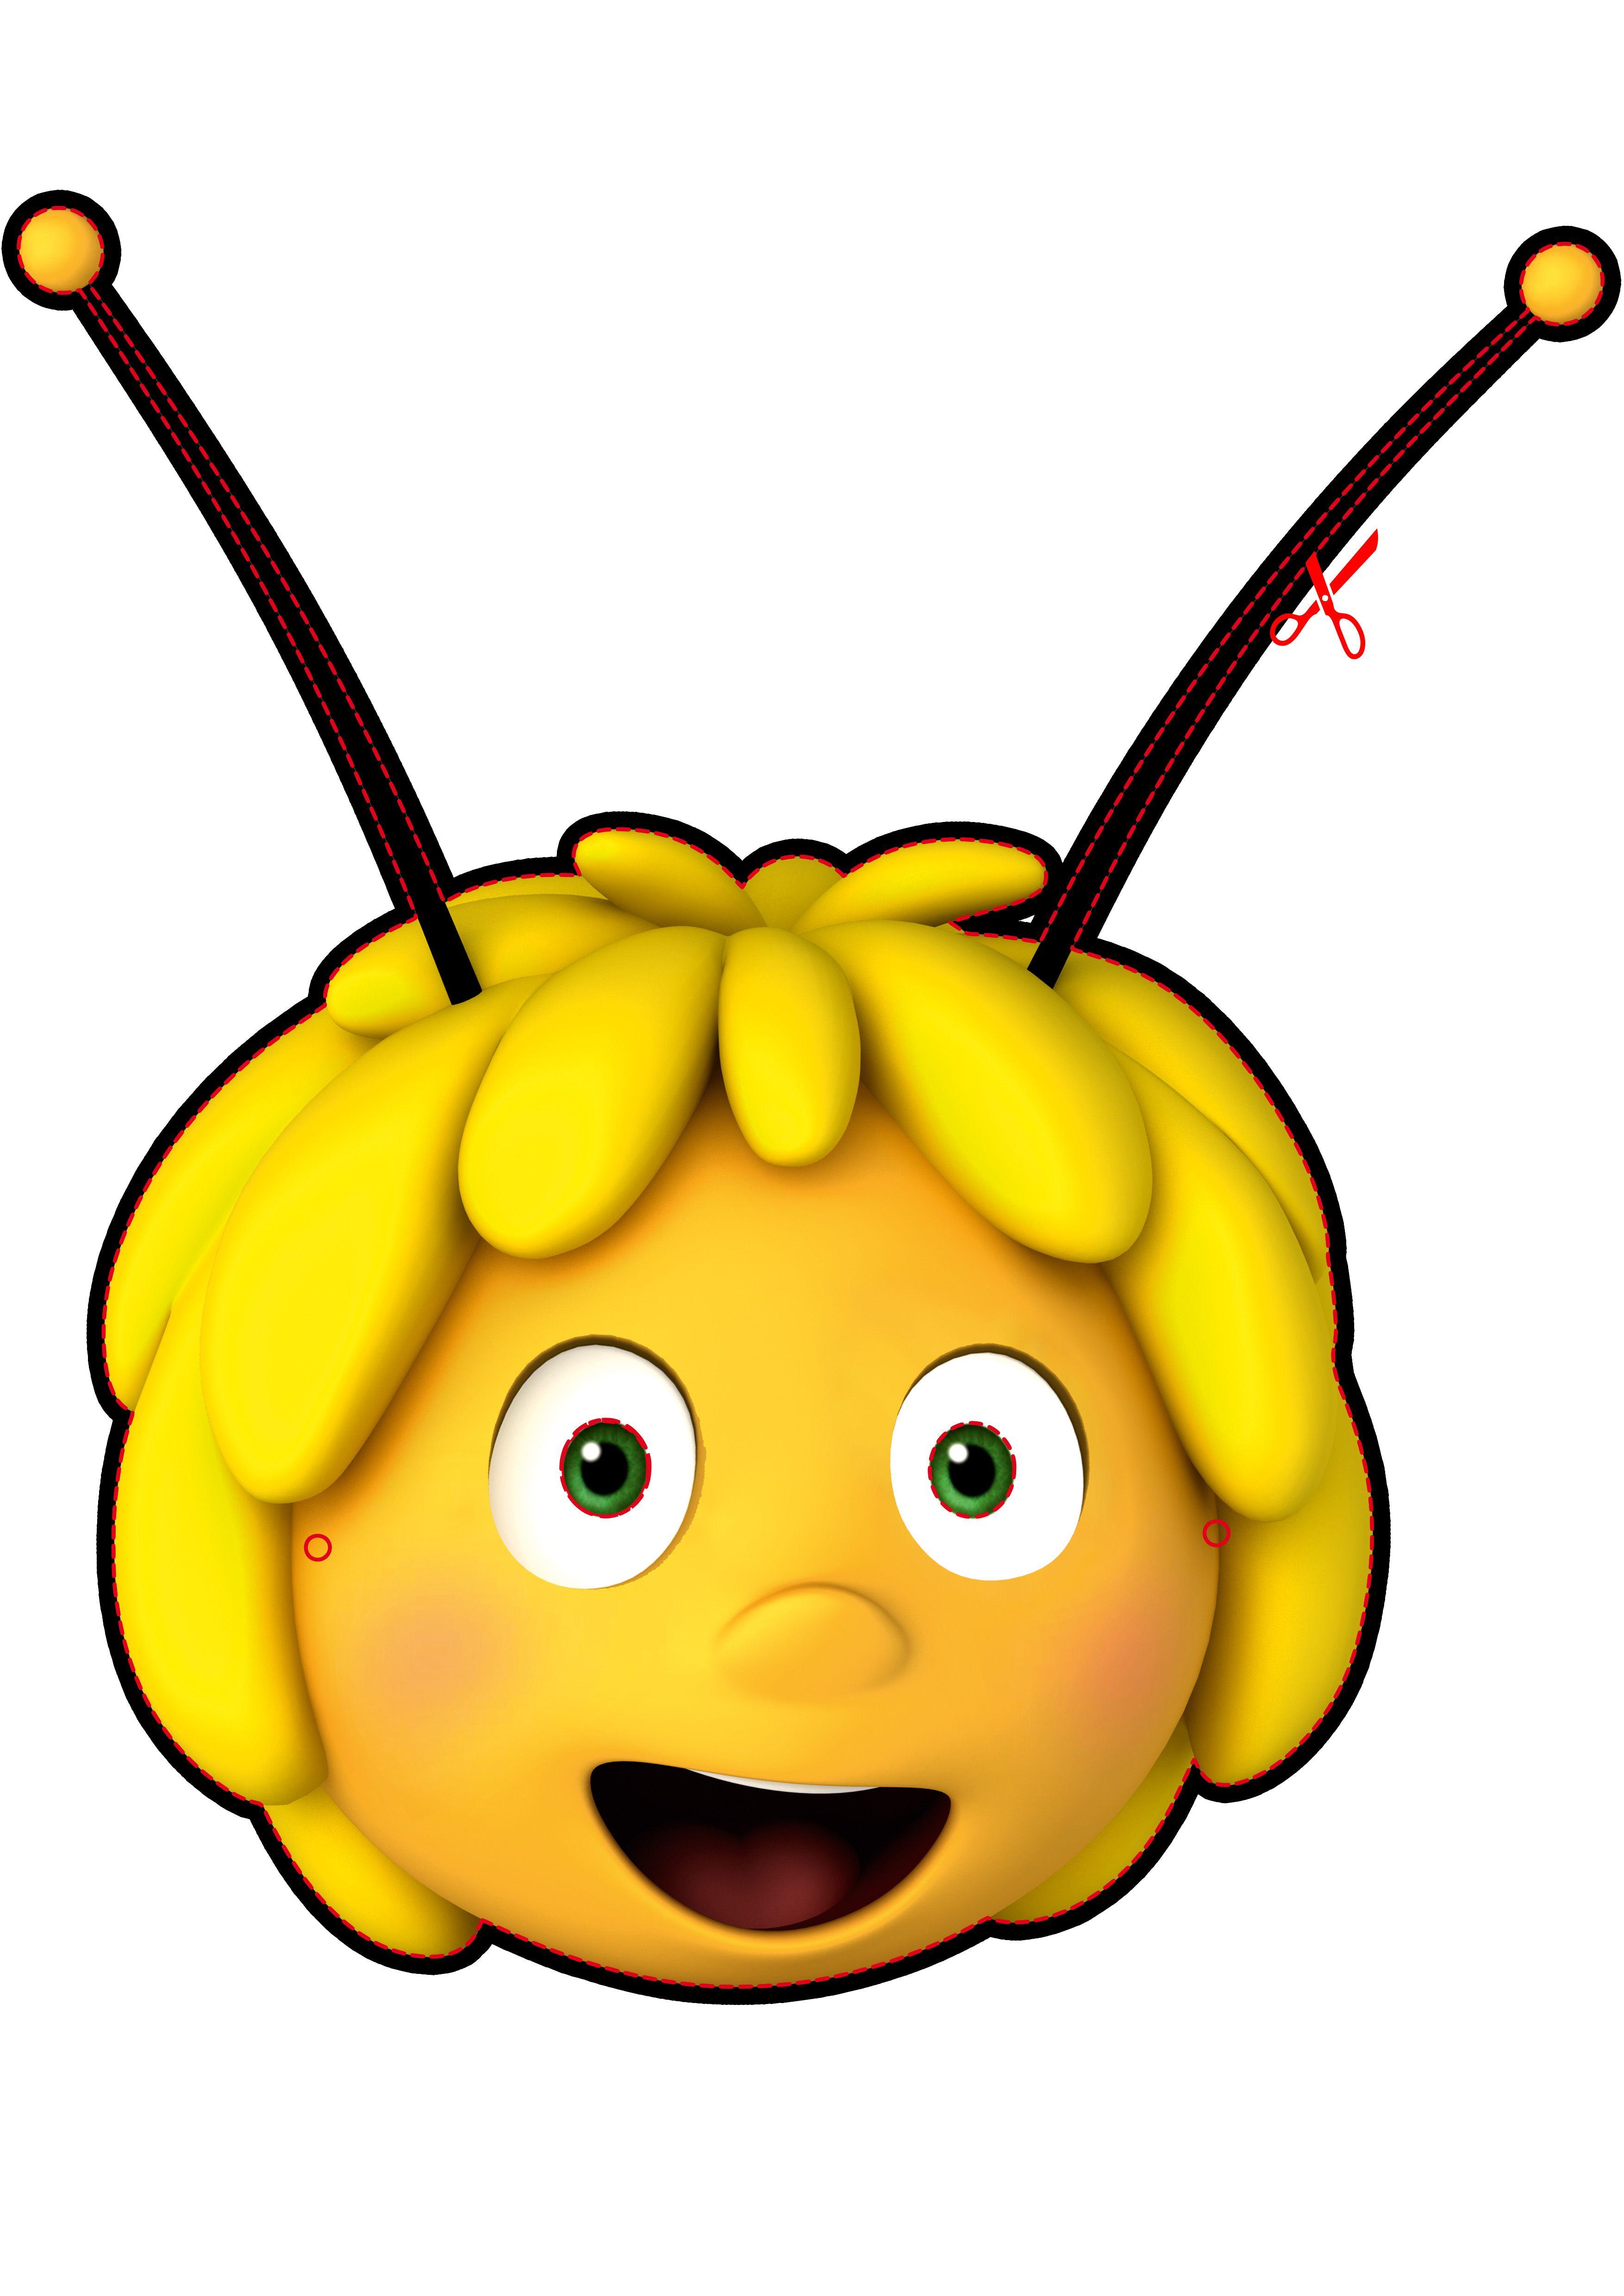 Careta ABEJA MAYA | Abelles | Bee party, Fiesta party, Bee image free download